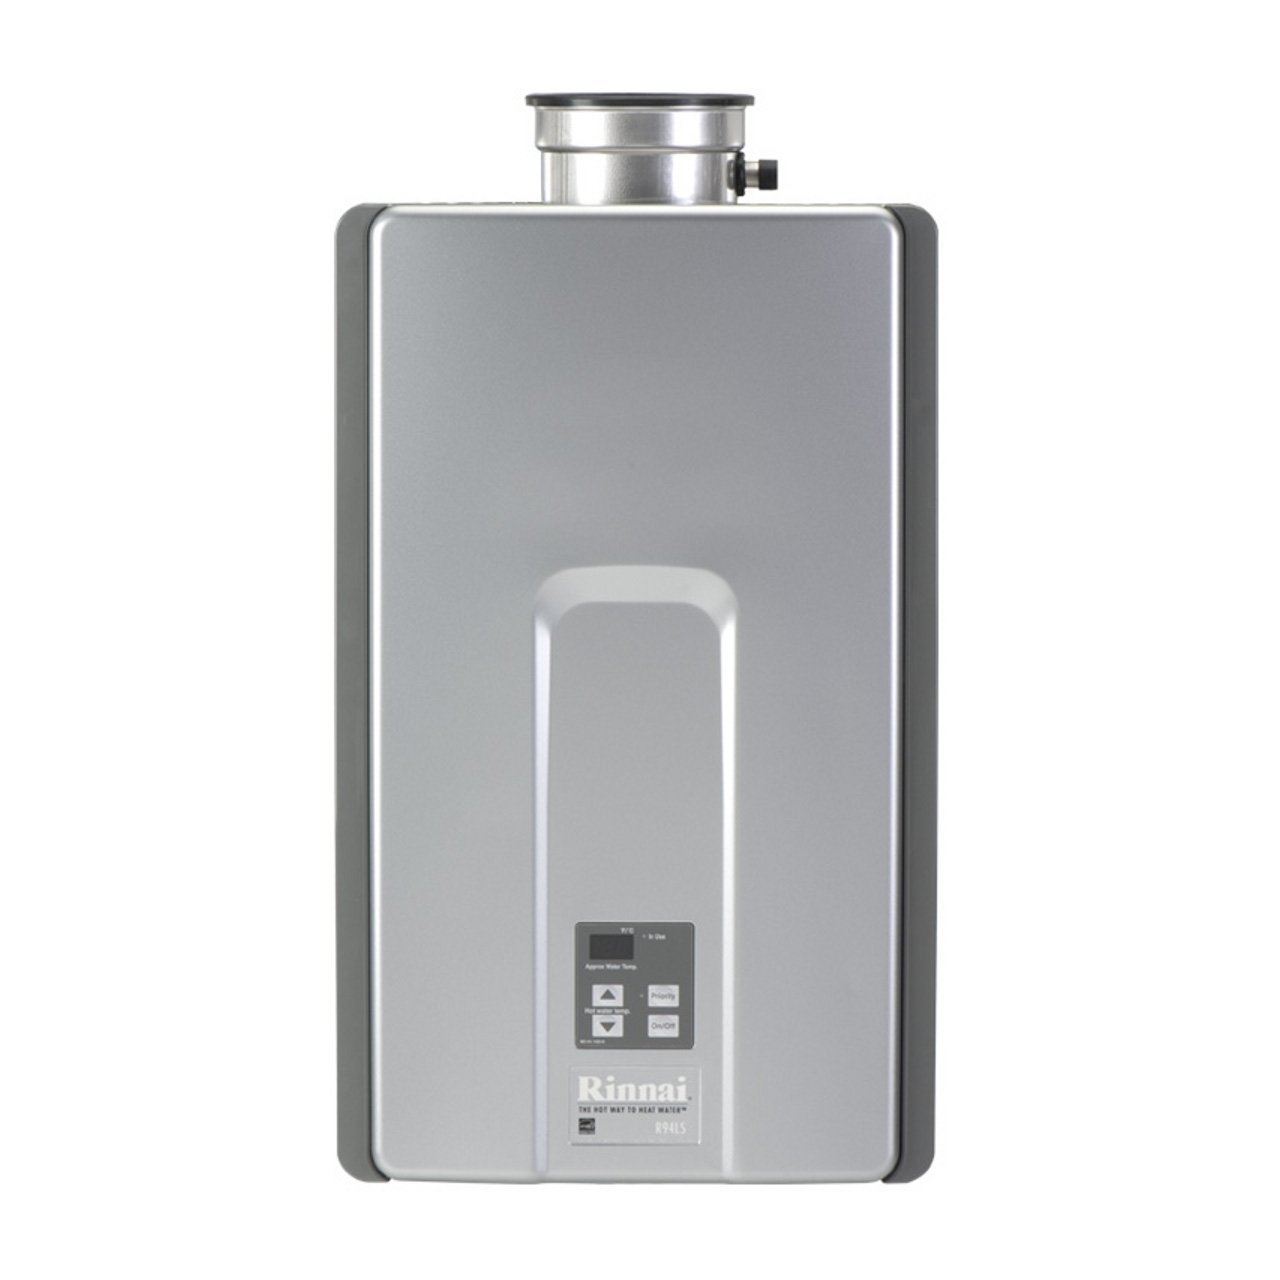 Hot Water Heater Clipart.